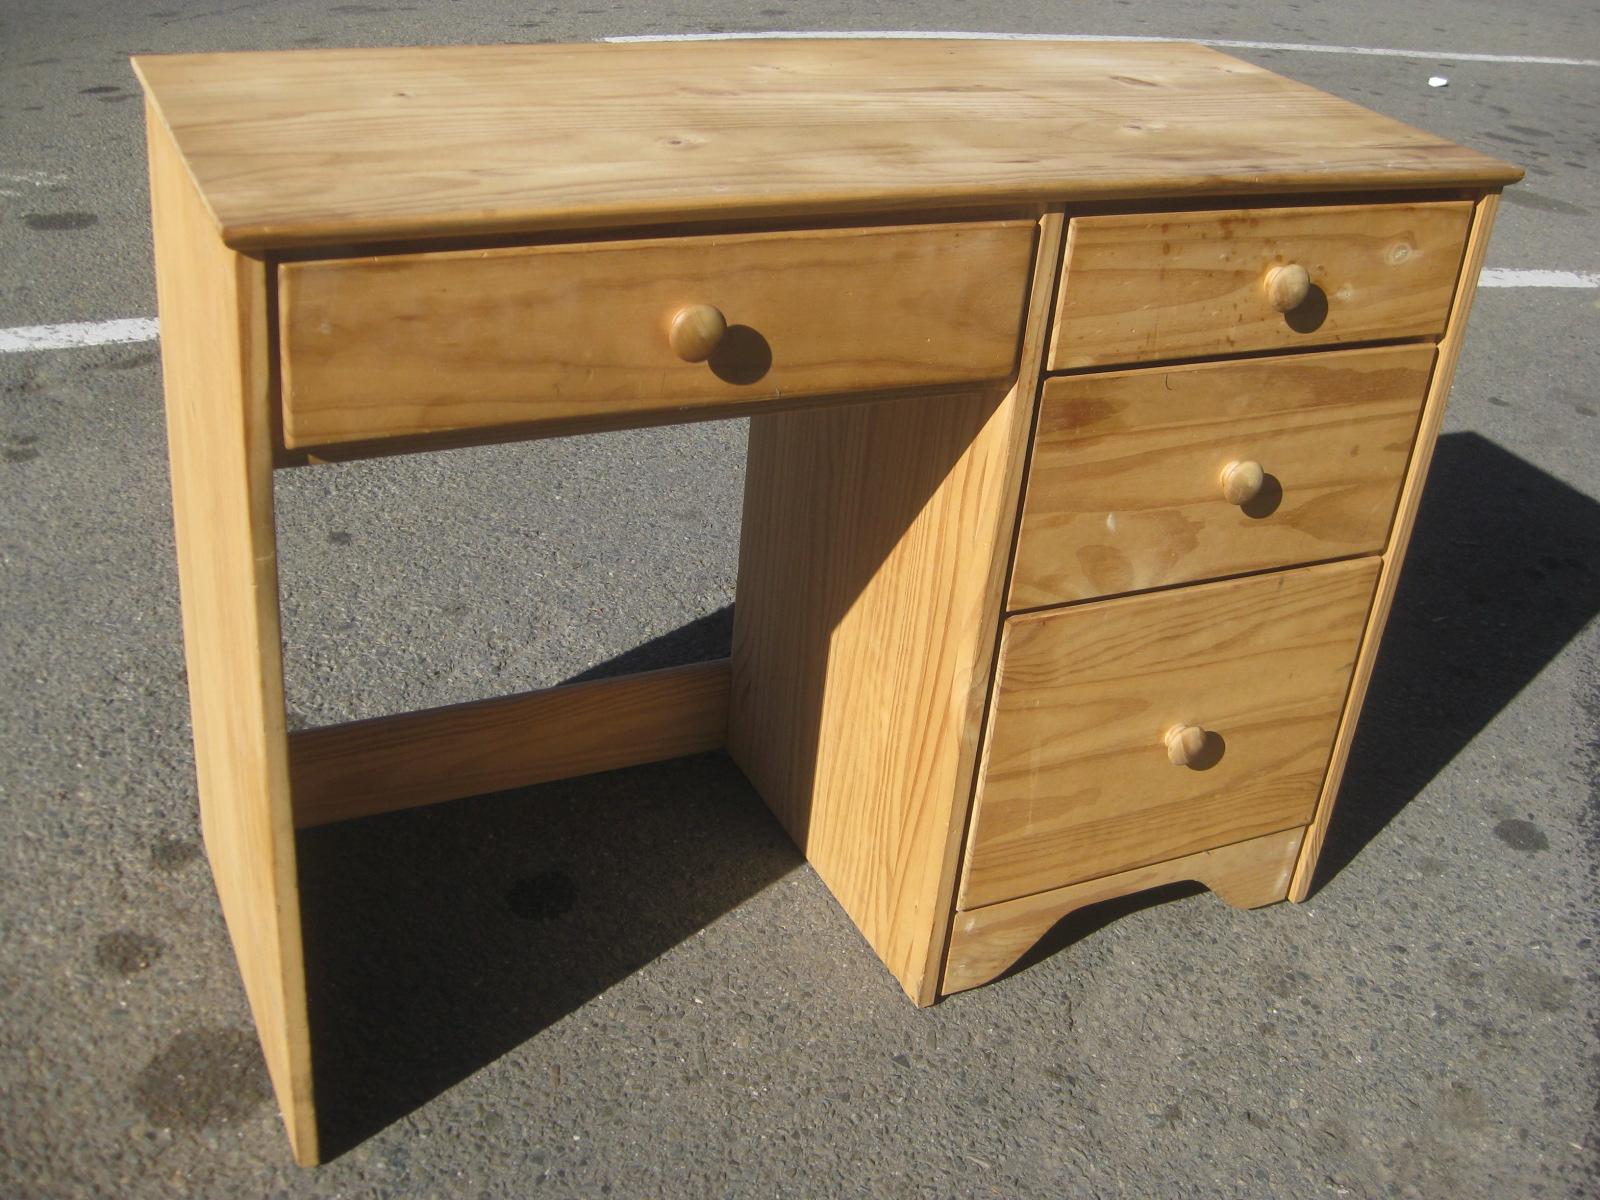 UHURU FURNITURE  COLLECTIBLES SOLD  Solid Pine Desk  50